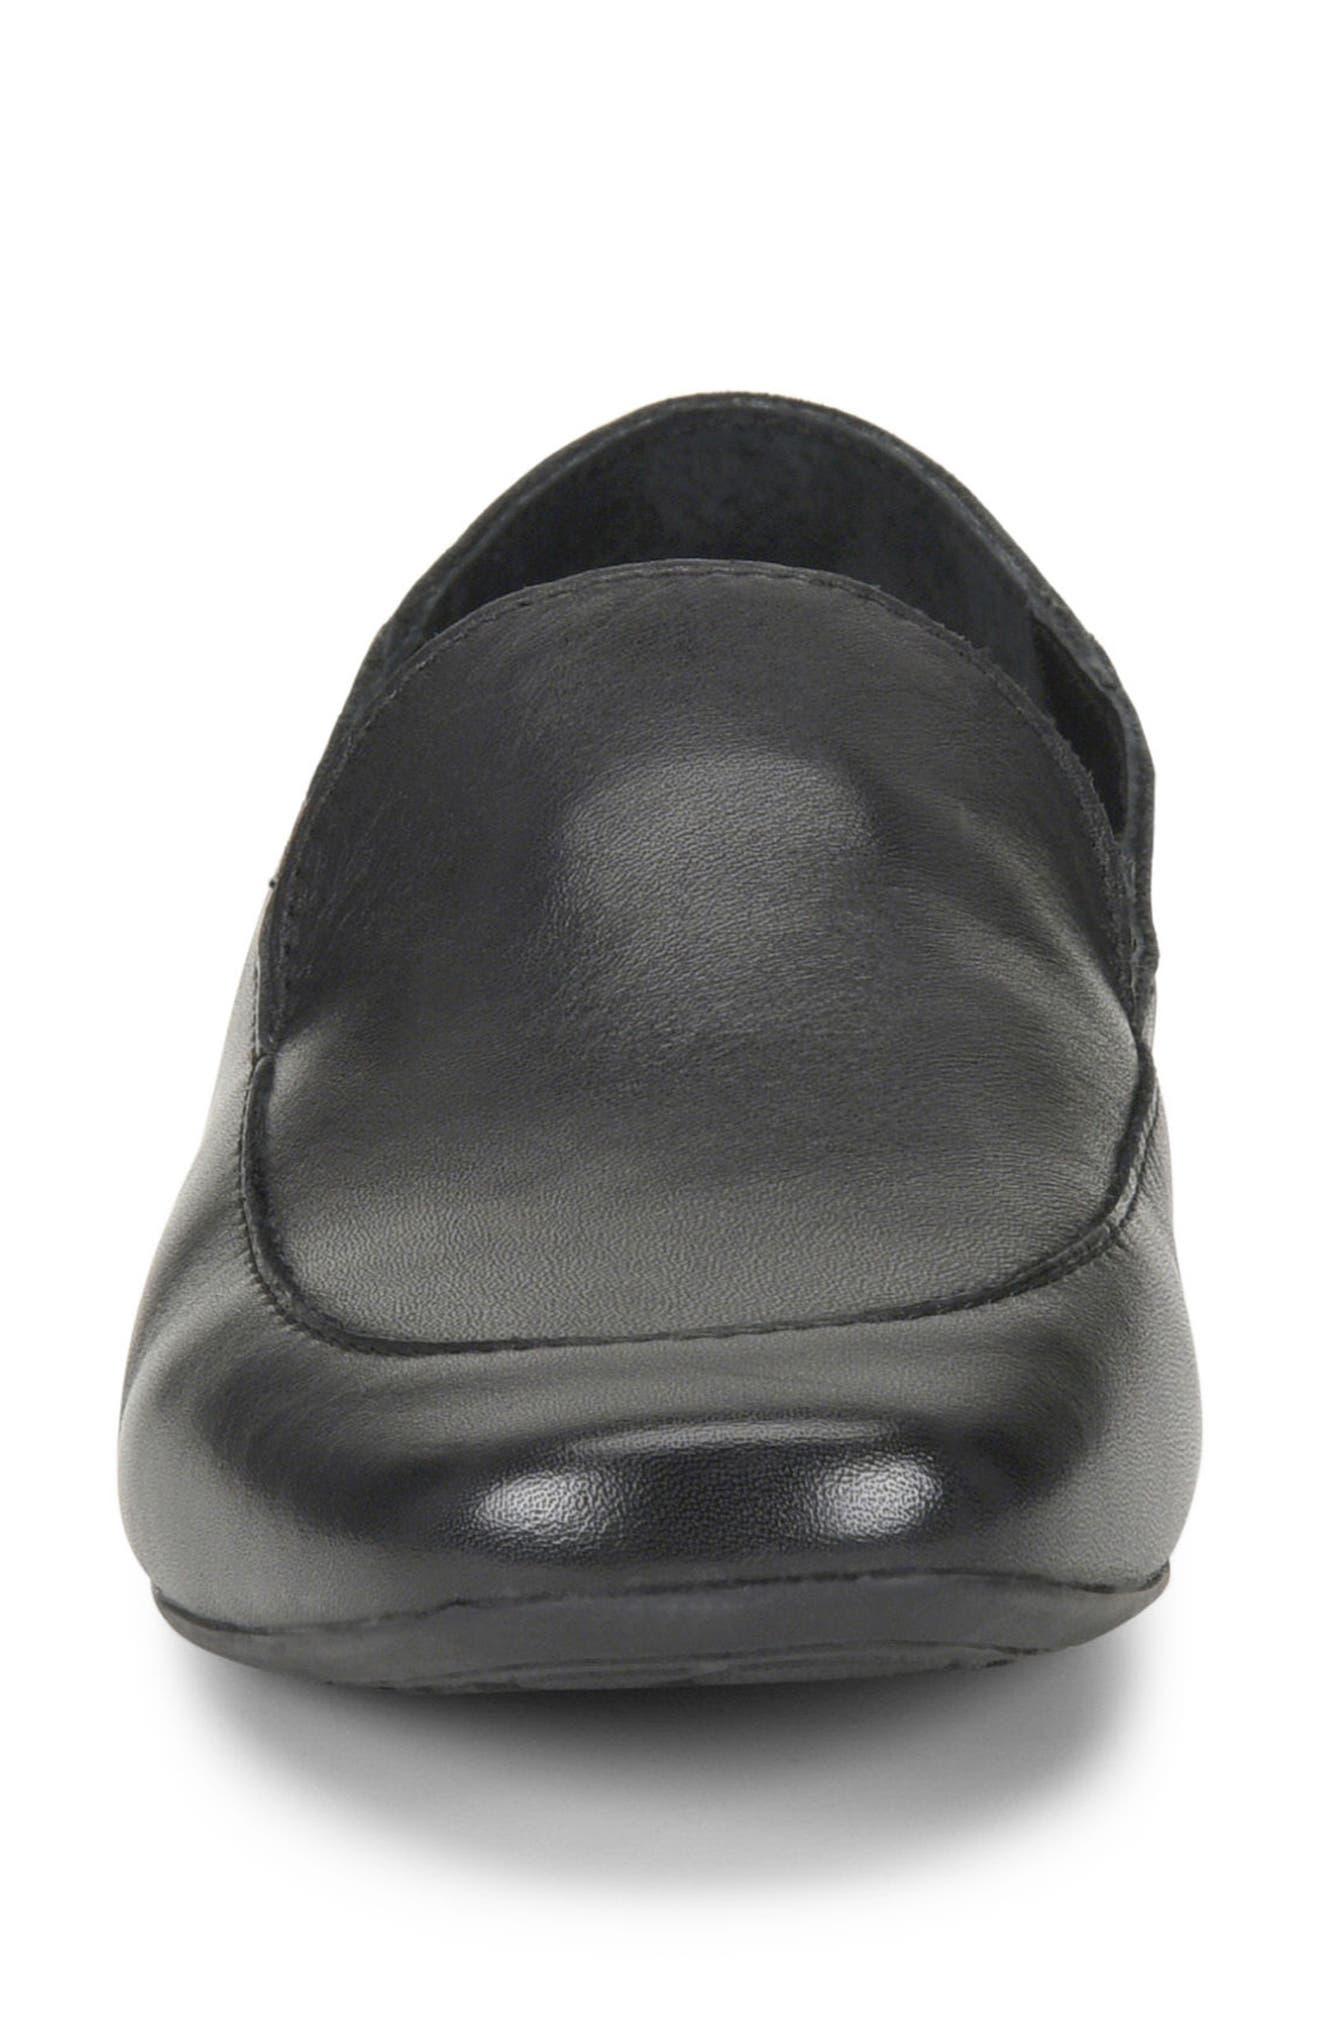 Carib Loafer,                             Alternate thumbnail 4, color,                             Black Leather